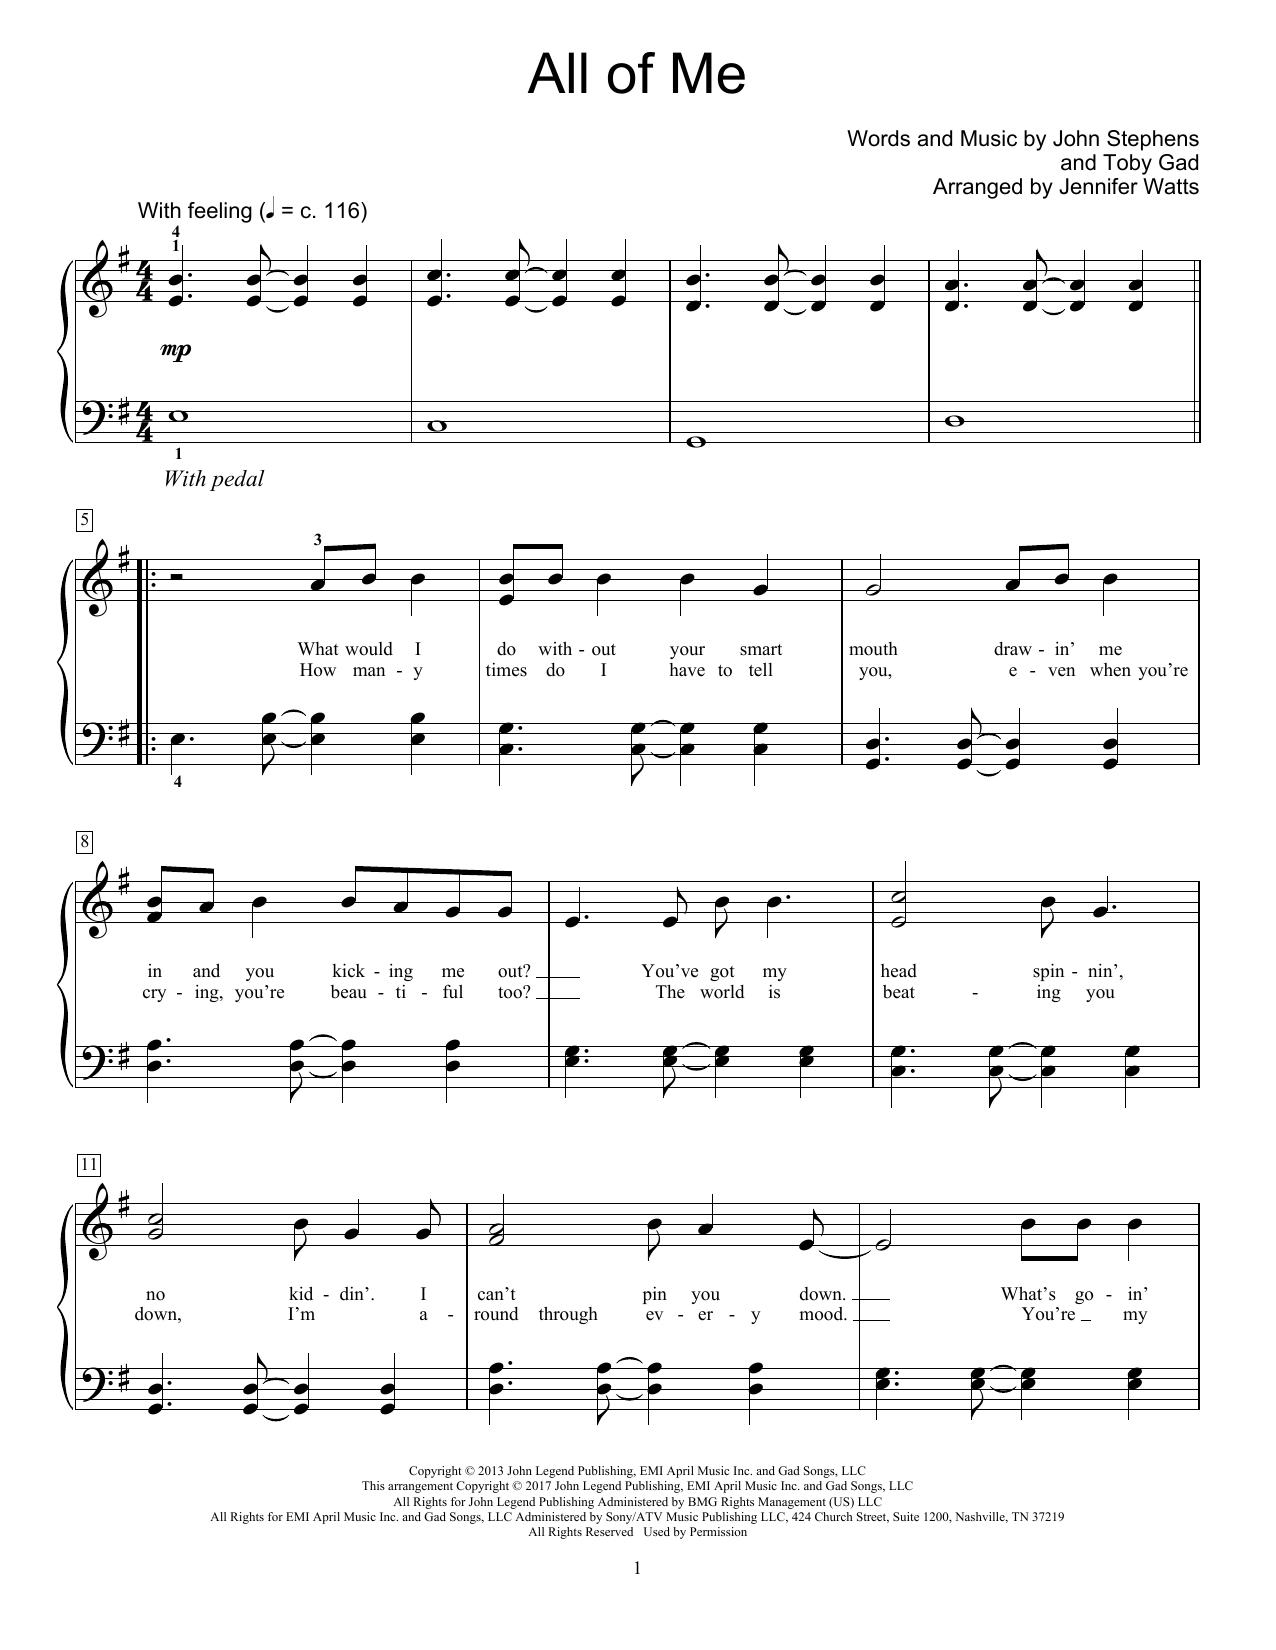 Sheet Music Digital Files To Print - Licensed John Stephens Digital - All Of Me Easy Piano Sheet Music Free Printable